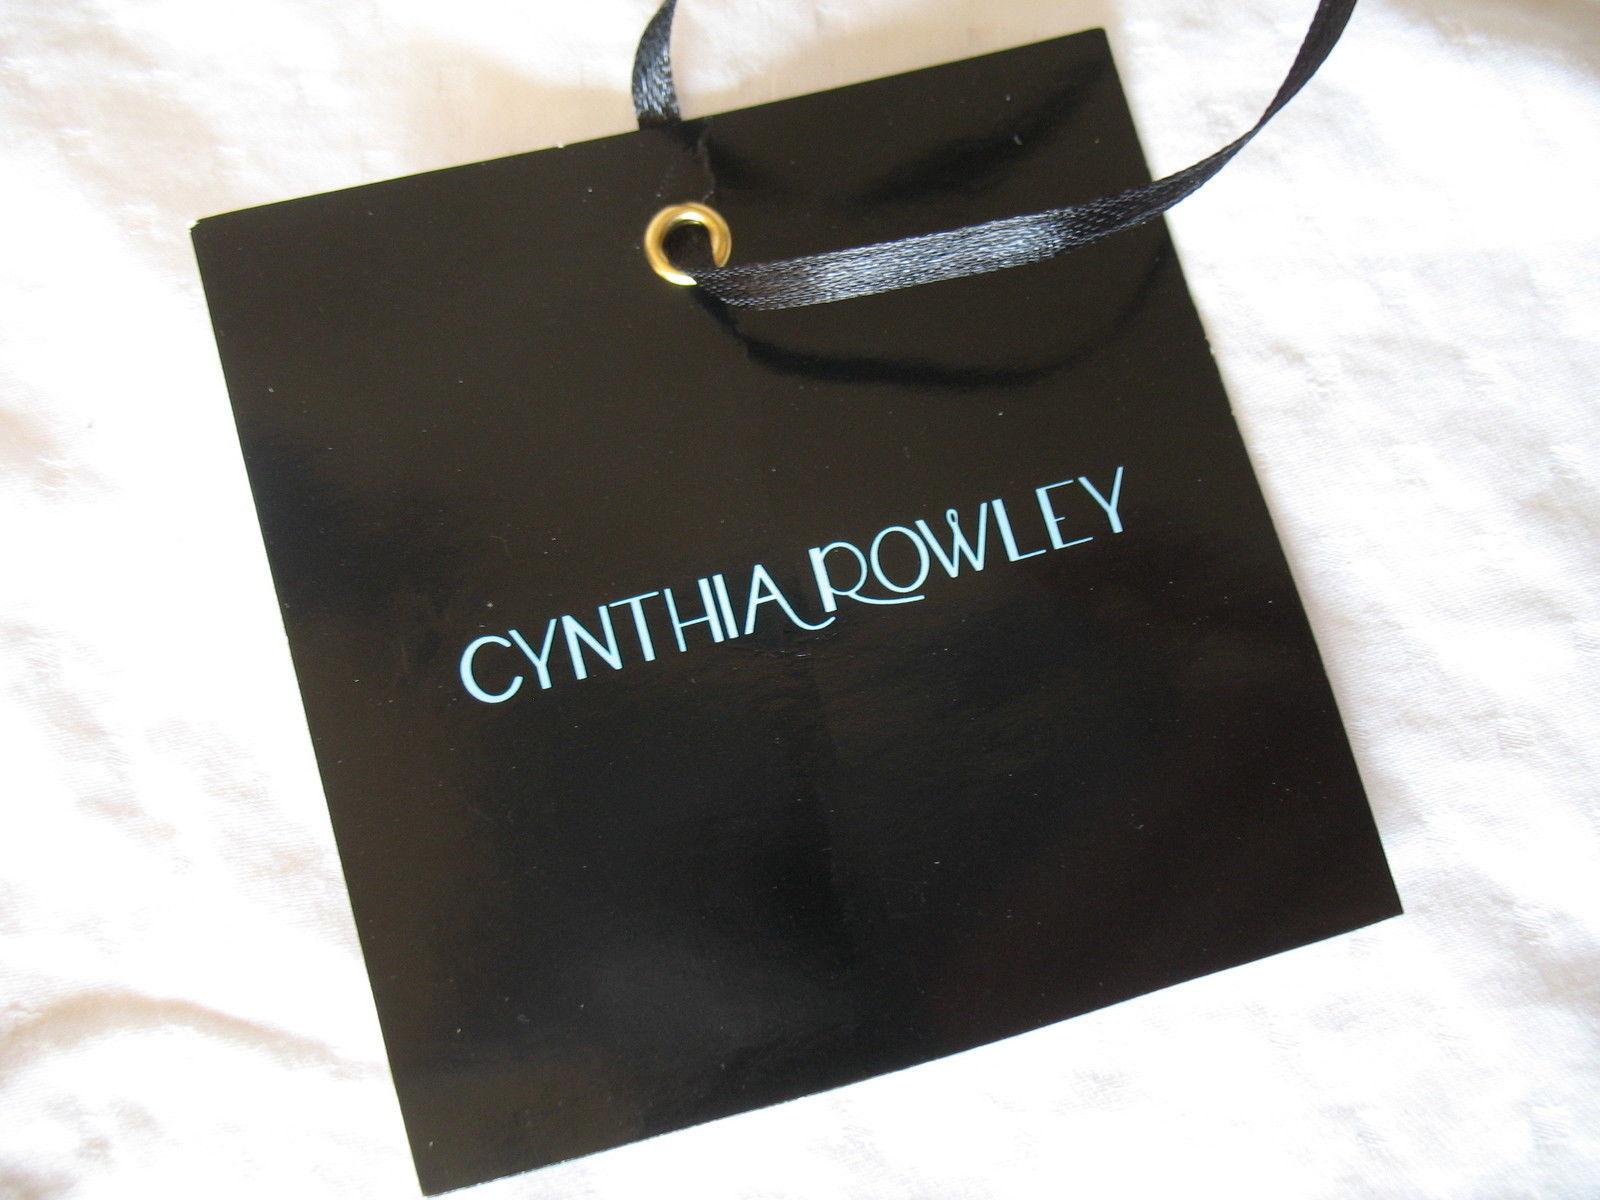 Cynthia Rowley Purse New Handbag Calloway Gray White Crossbody Leather Ash Color image 7